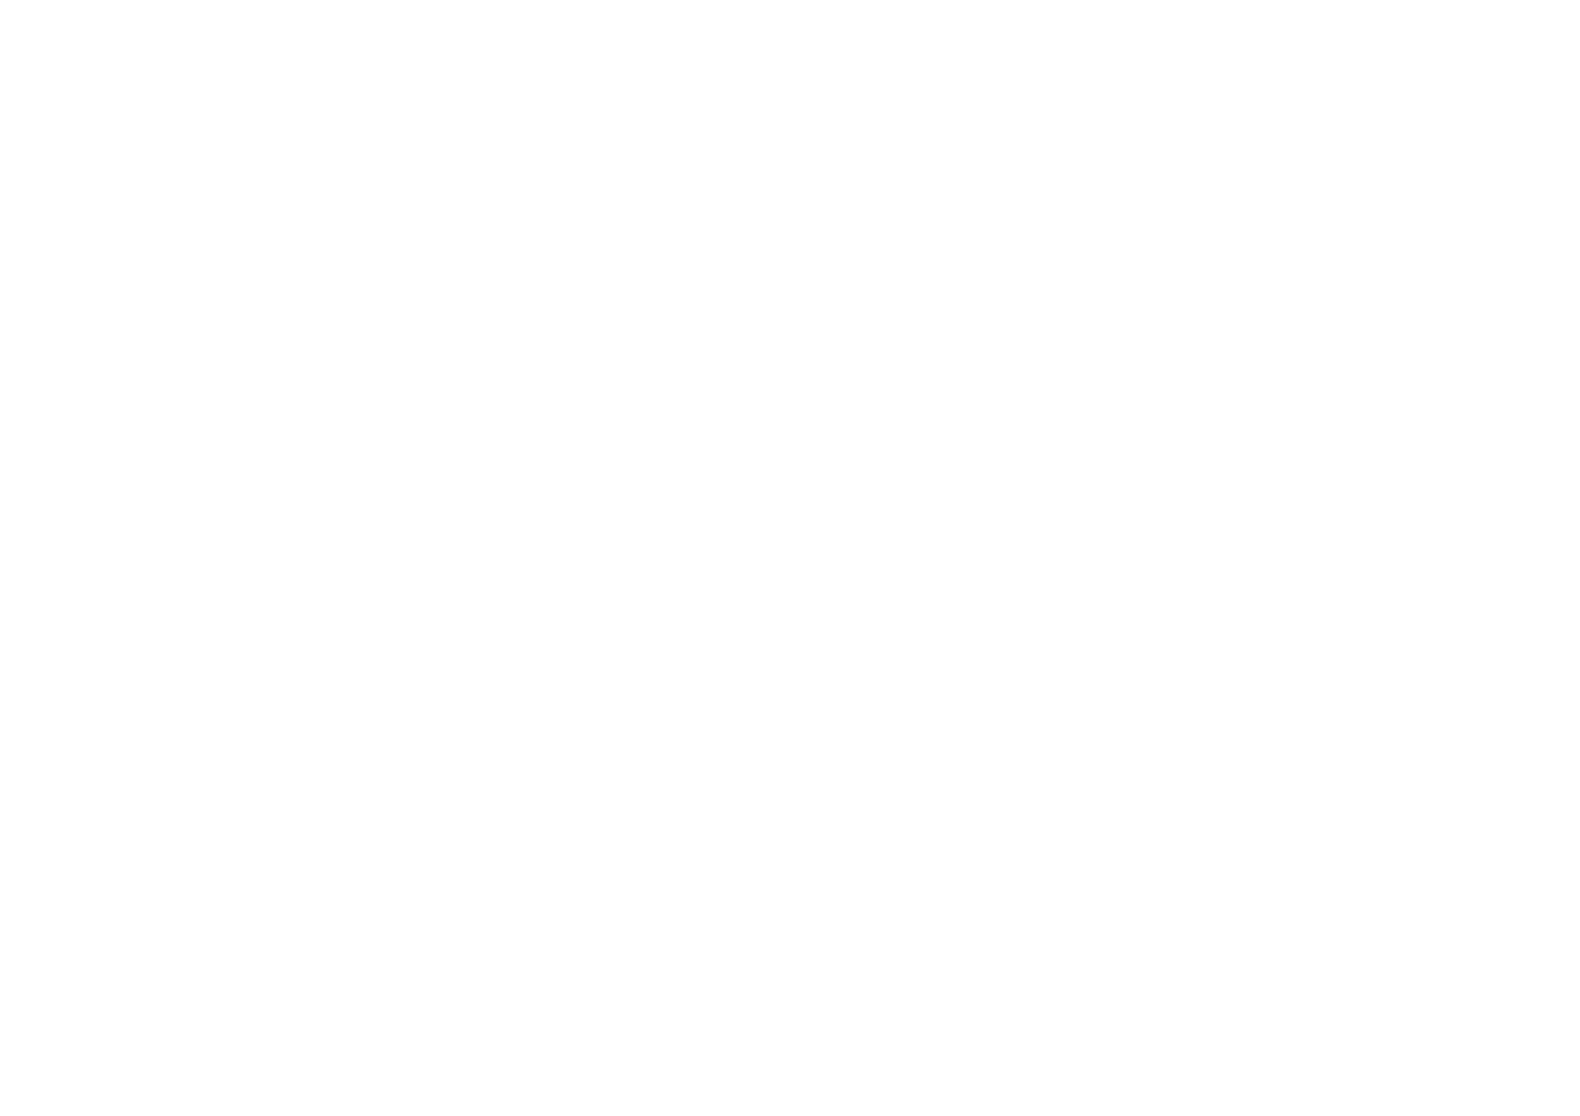 Kooley&Co._LowerCaseLogo_White